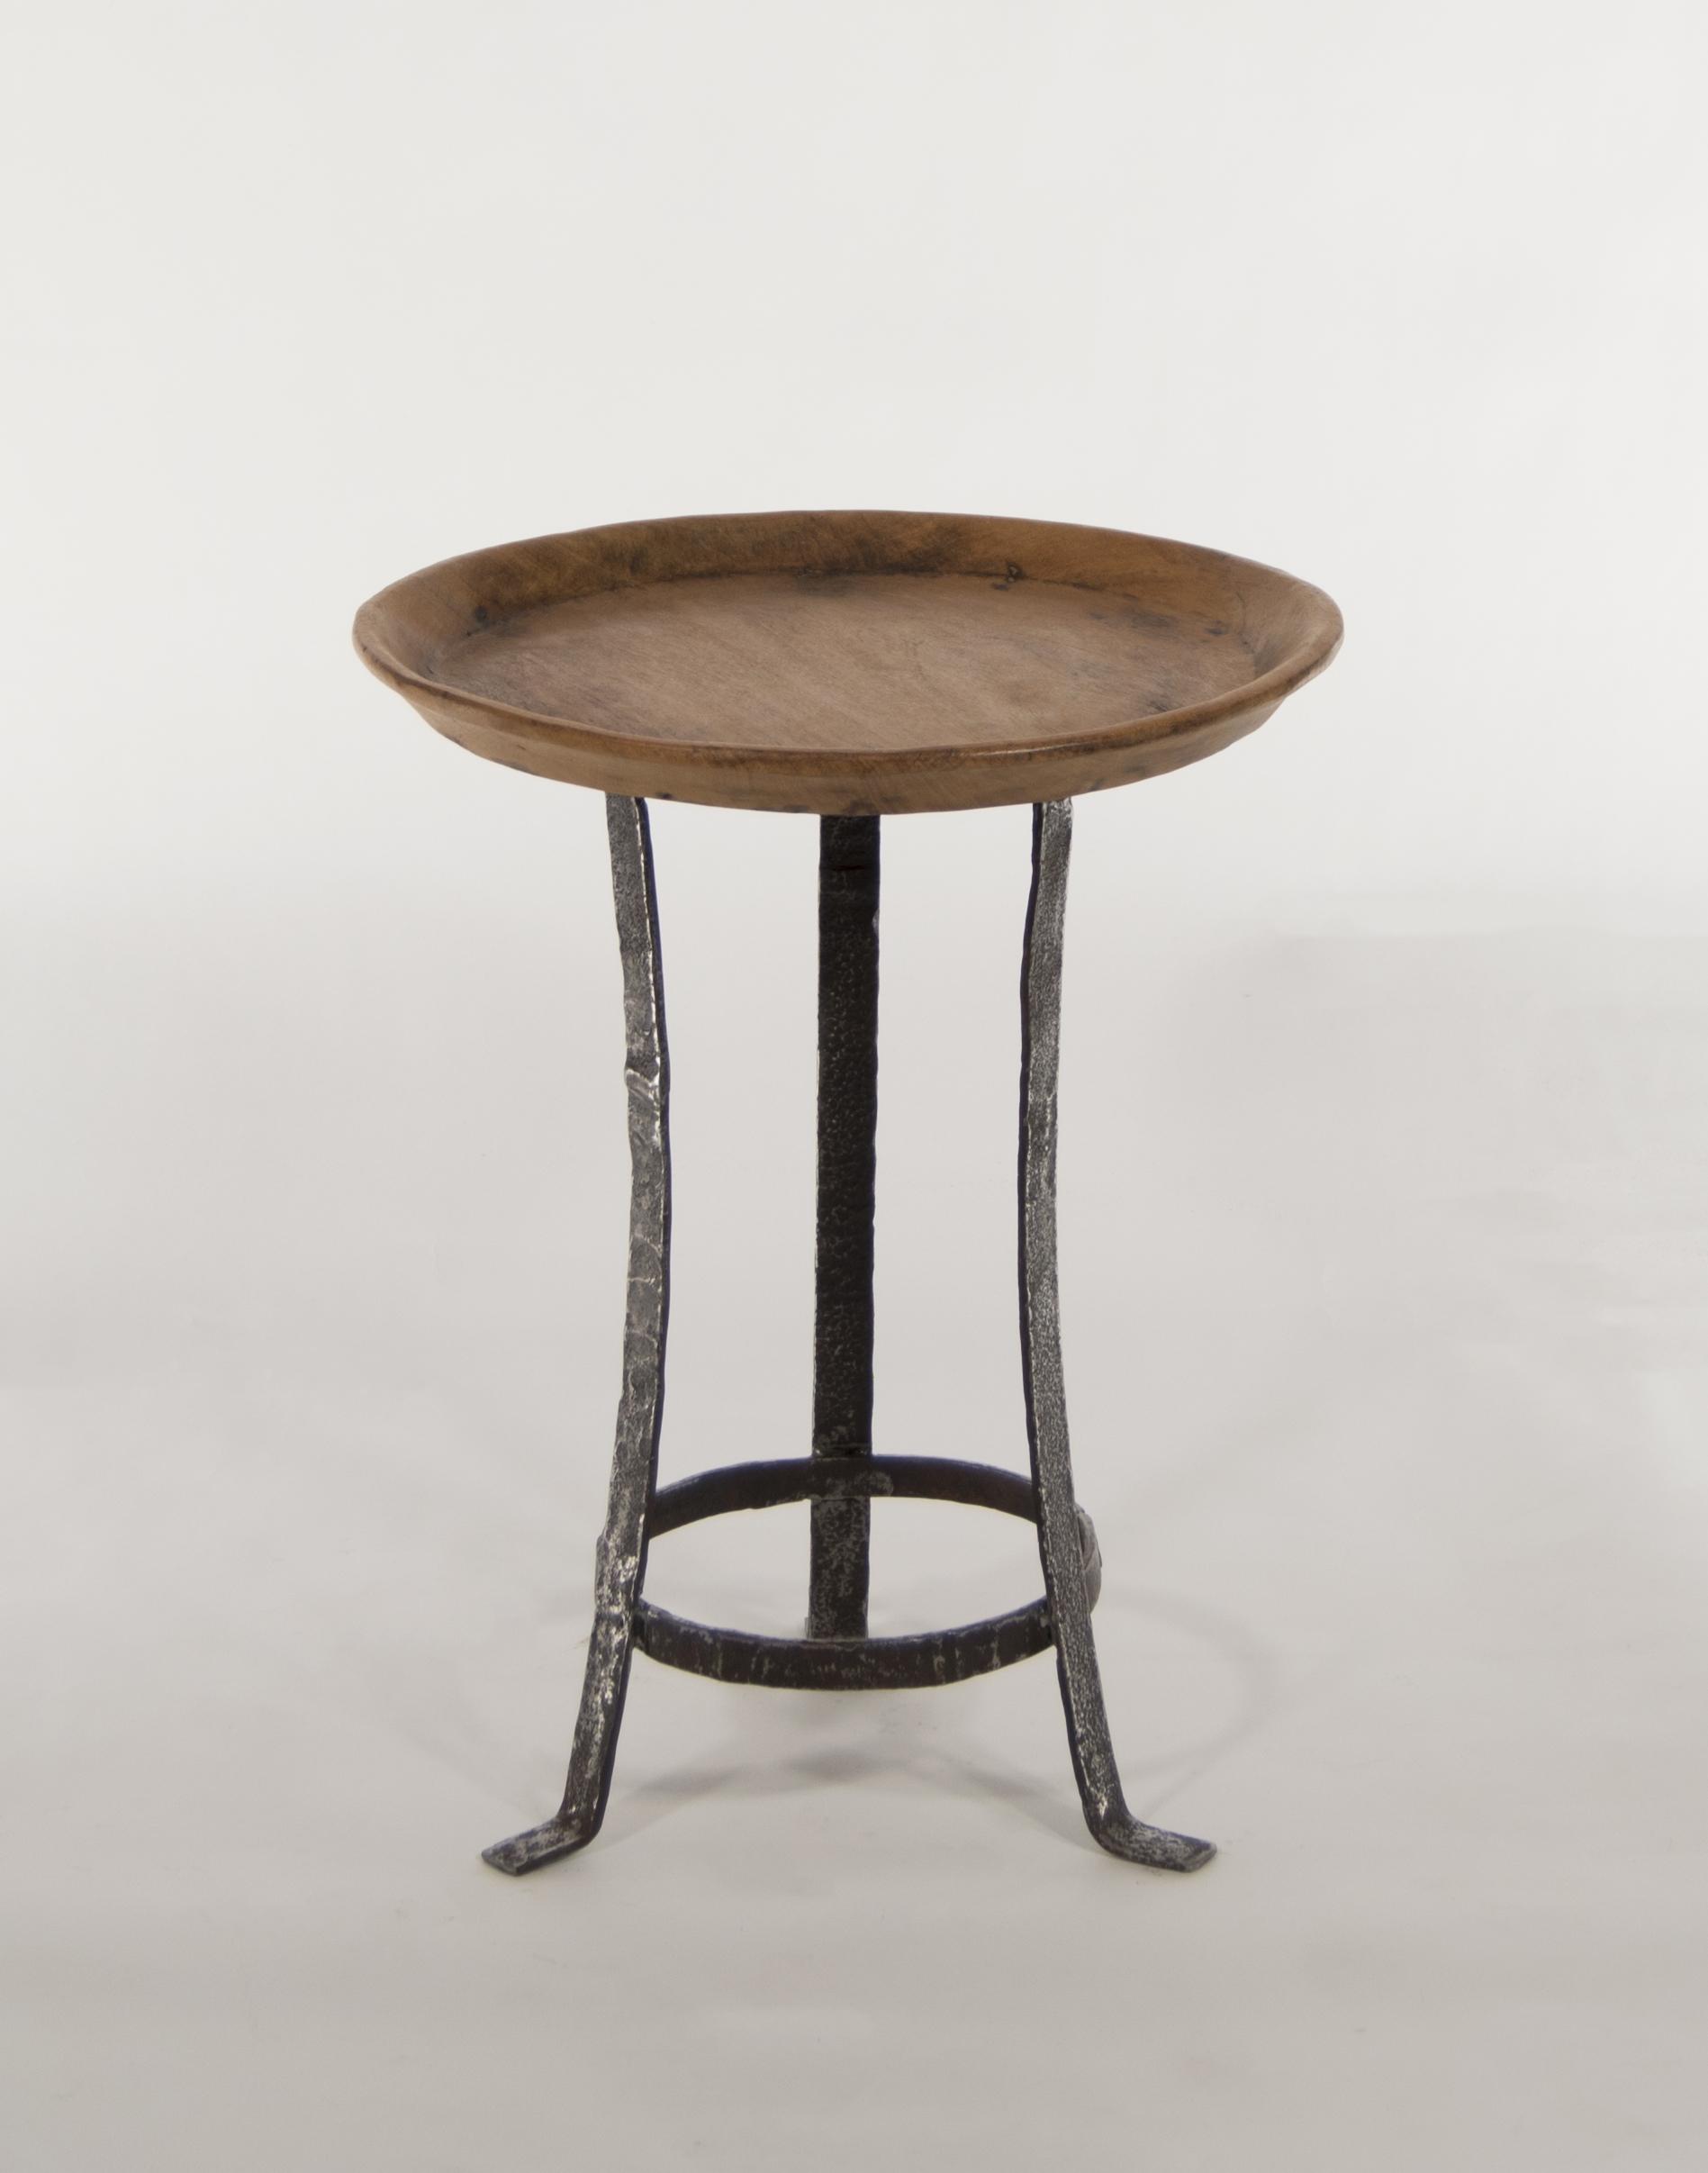 Iron Leg Rice Tray Table Living Room Furniture Teak West